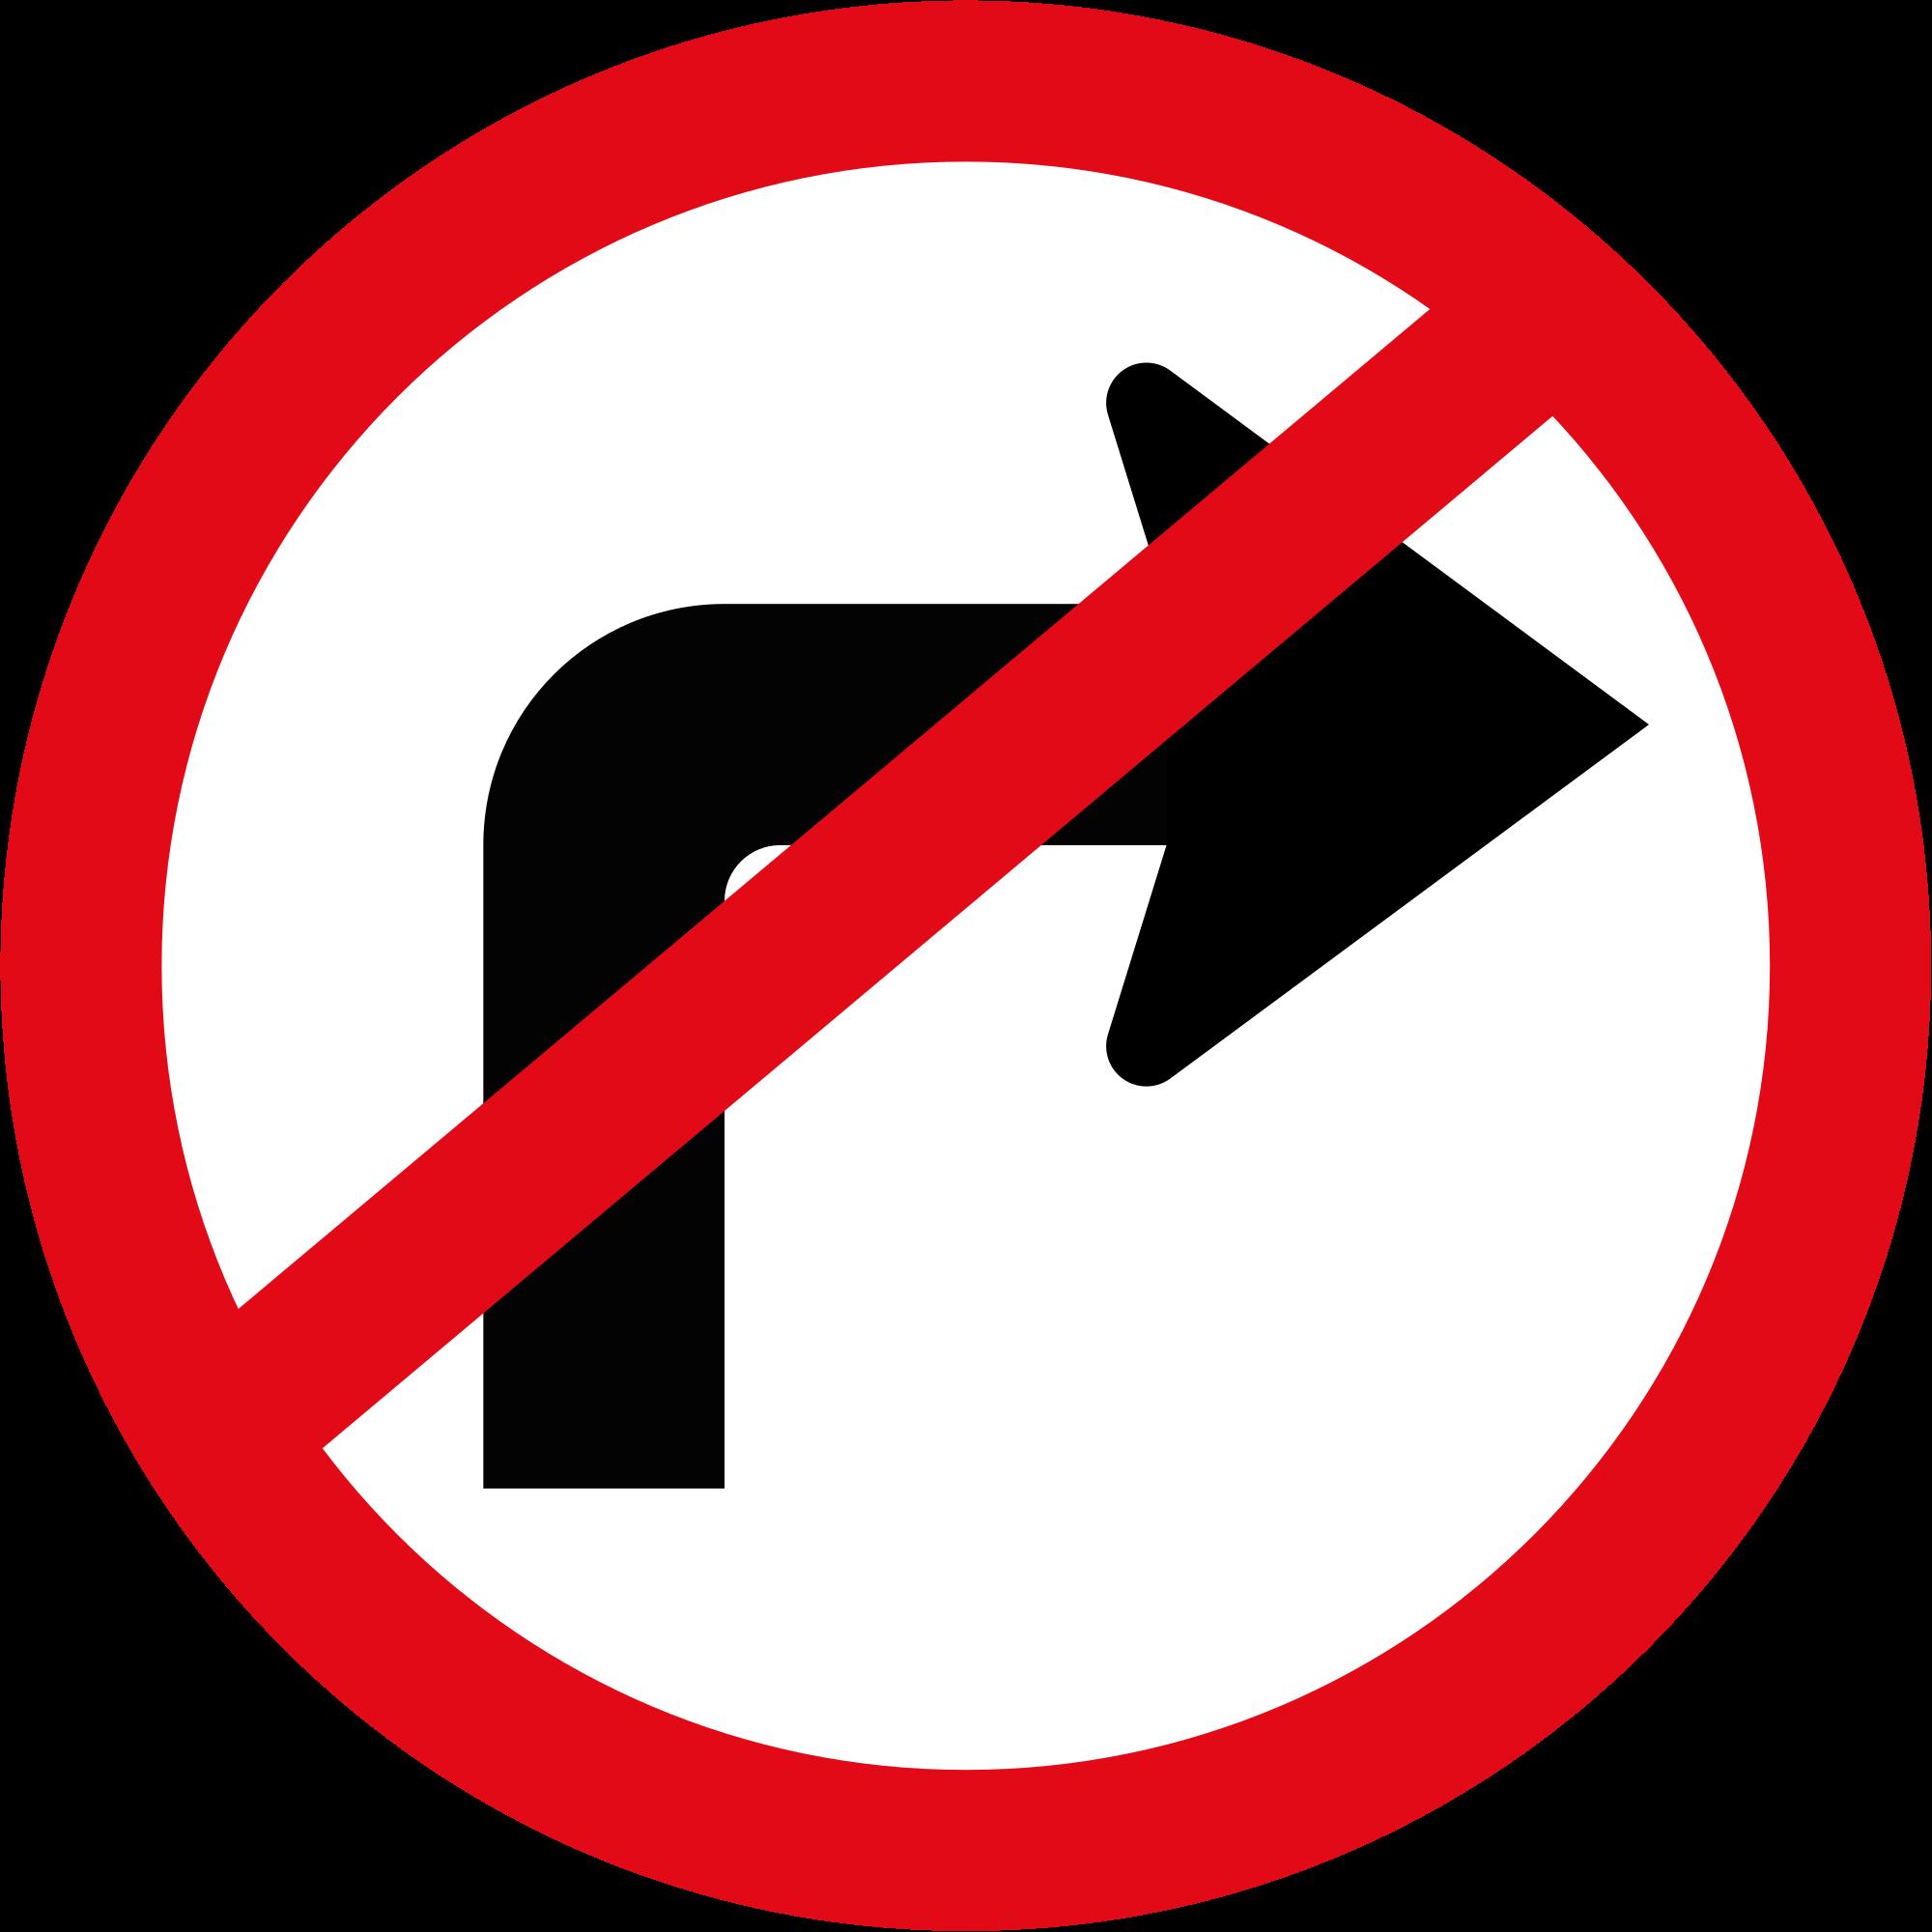 Clipart road presentation. File sadc sign r